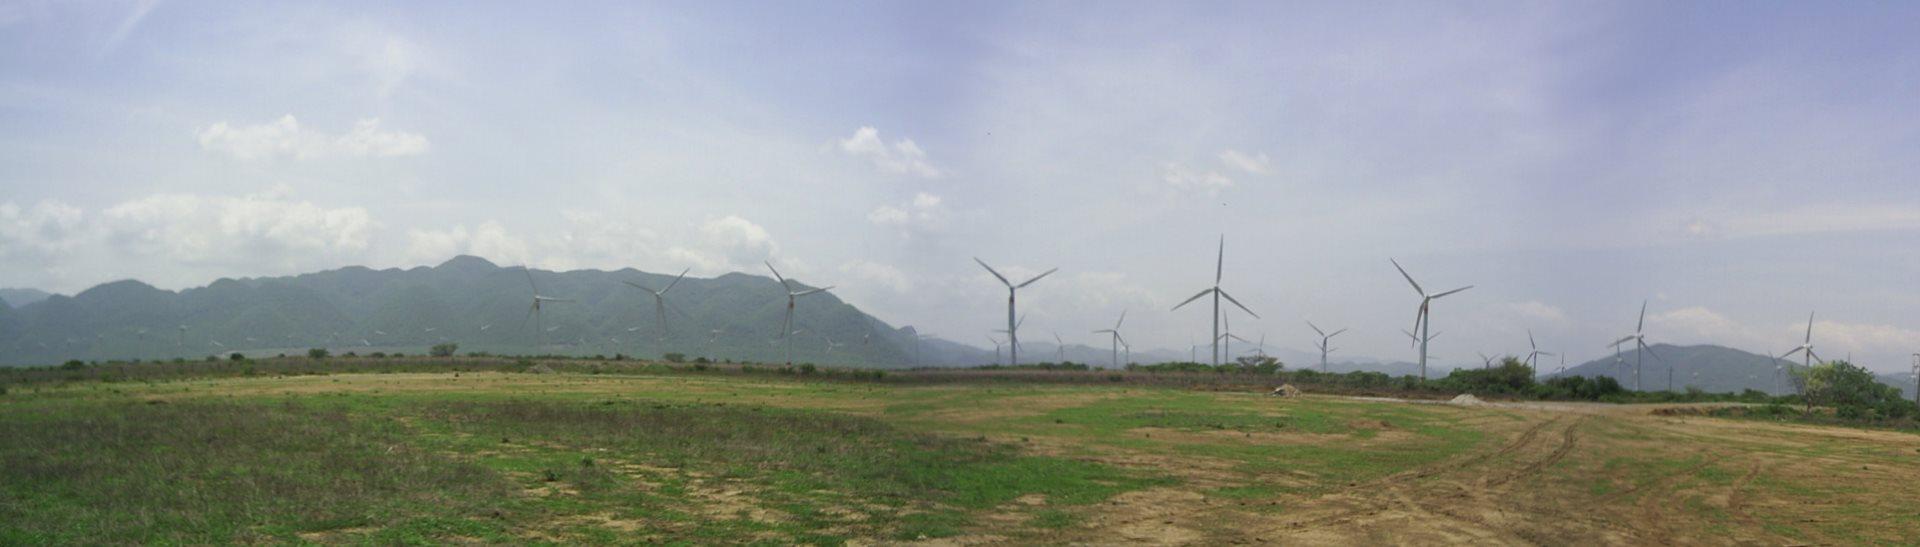 Wind Turbines in Oaxaca